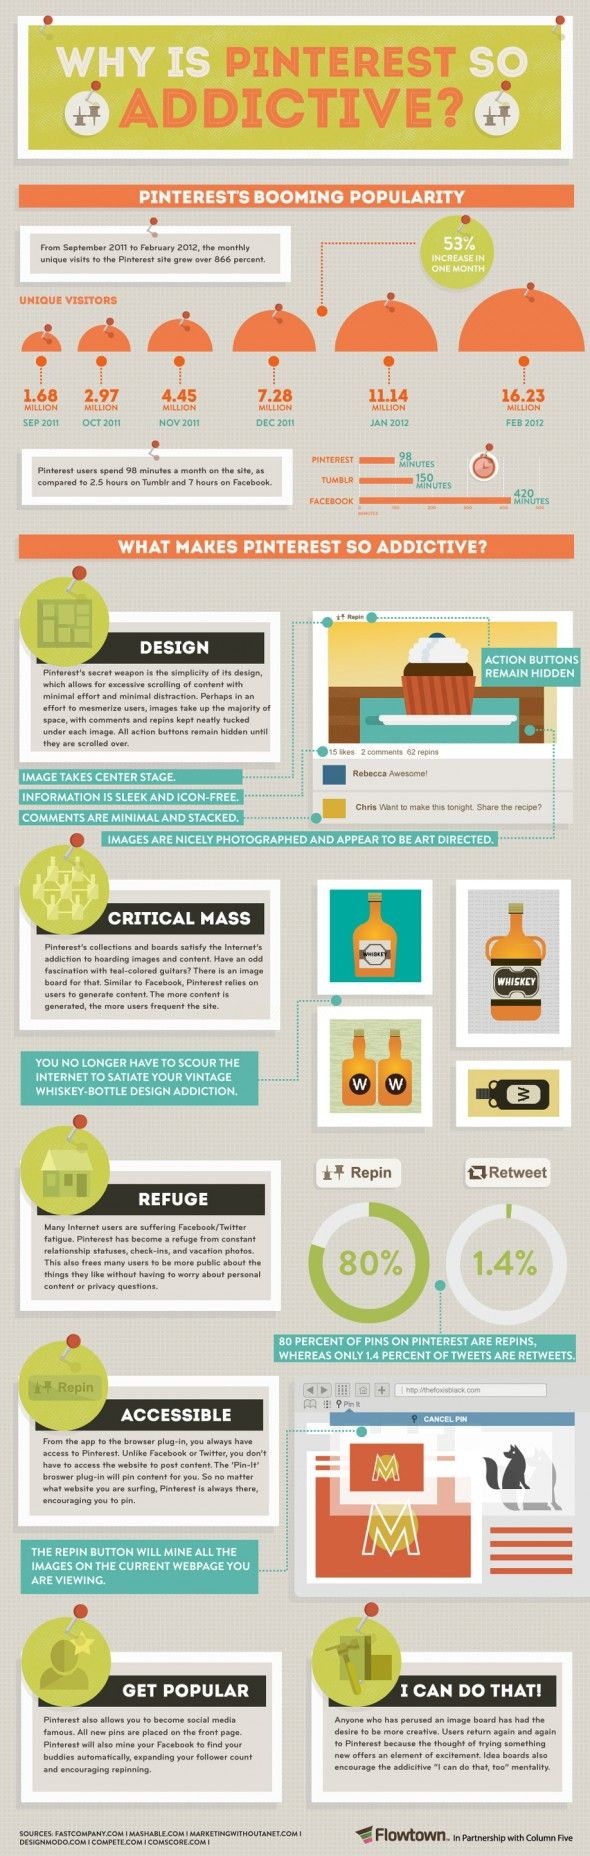 Why is Pinterest so addictive? [INFOGRAPHIC]Social Network, Social Media Marketing, Digital Marketing, Internet Marketing, Zombies Apocalyps, Pinterest Addict, New Products, Infographic, Socialmedia